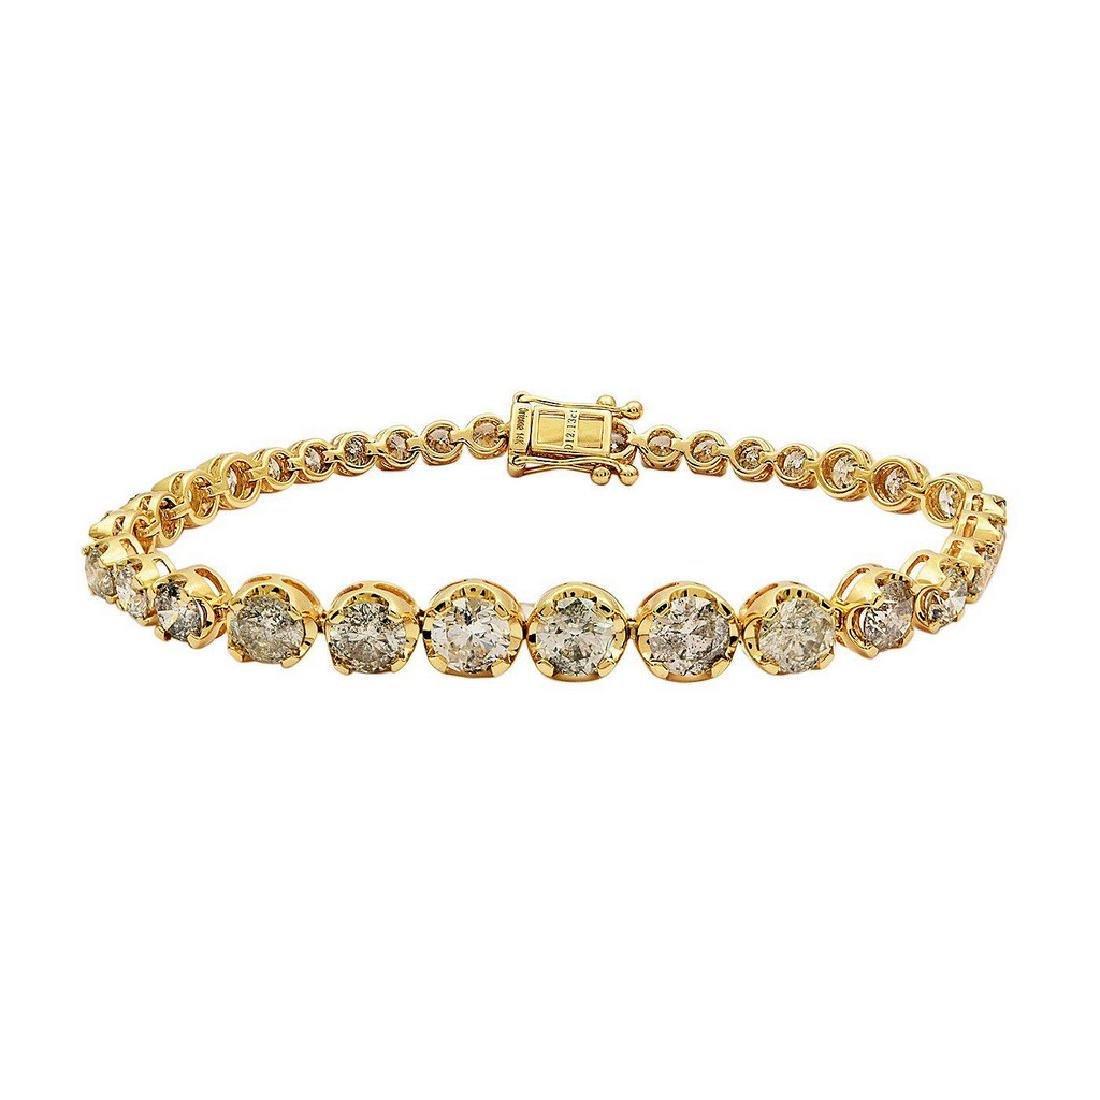 14K Yellow Gold 12.12ctw Diamond Tennis Bracelet